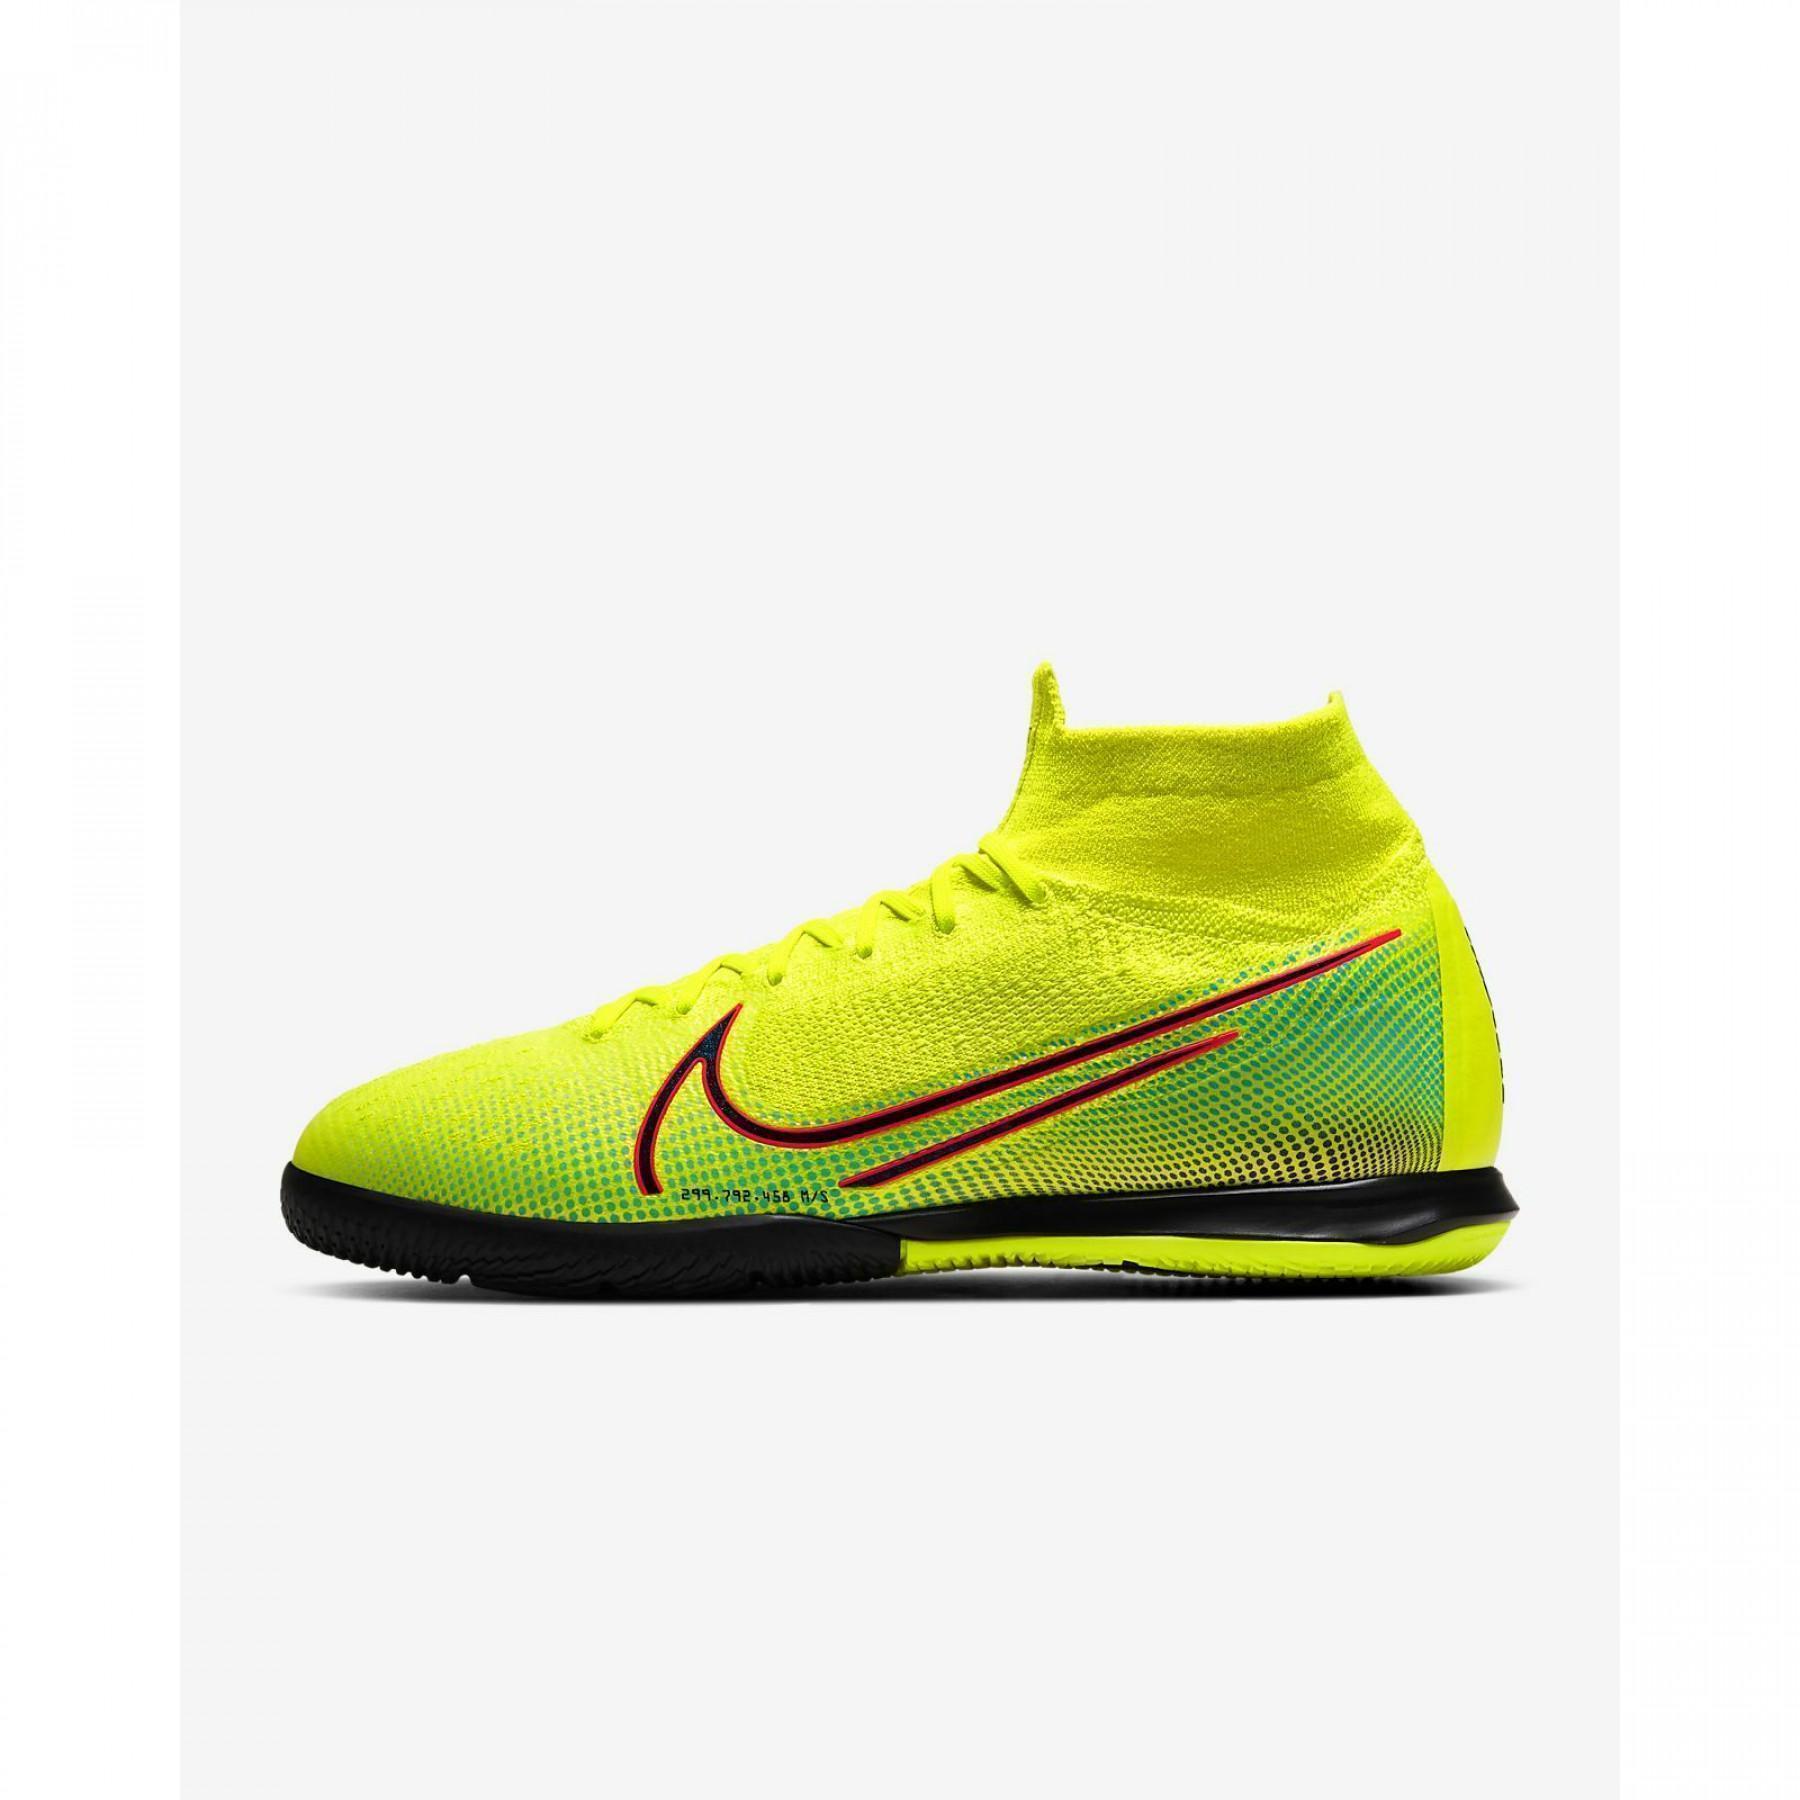 Chaussures Nike Mercurial Superfly 7 Elite MDS Indoor